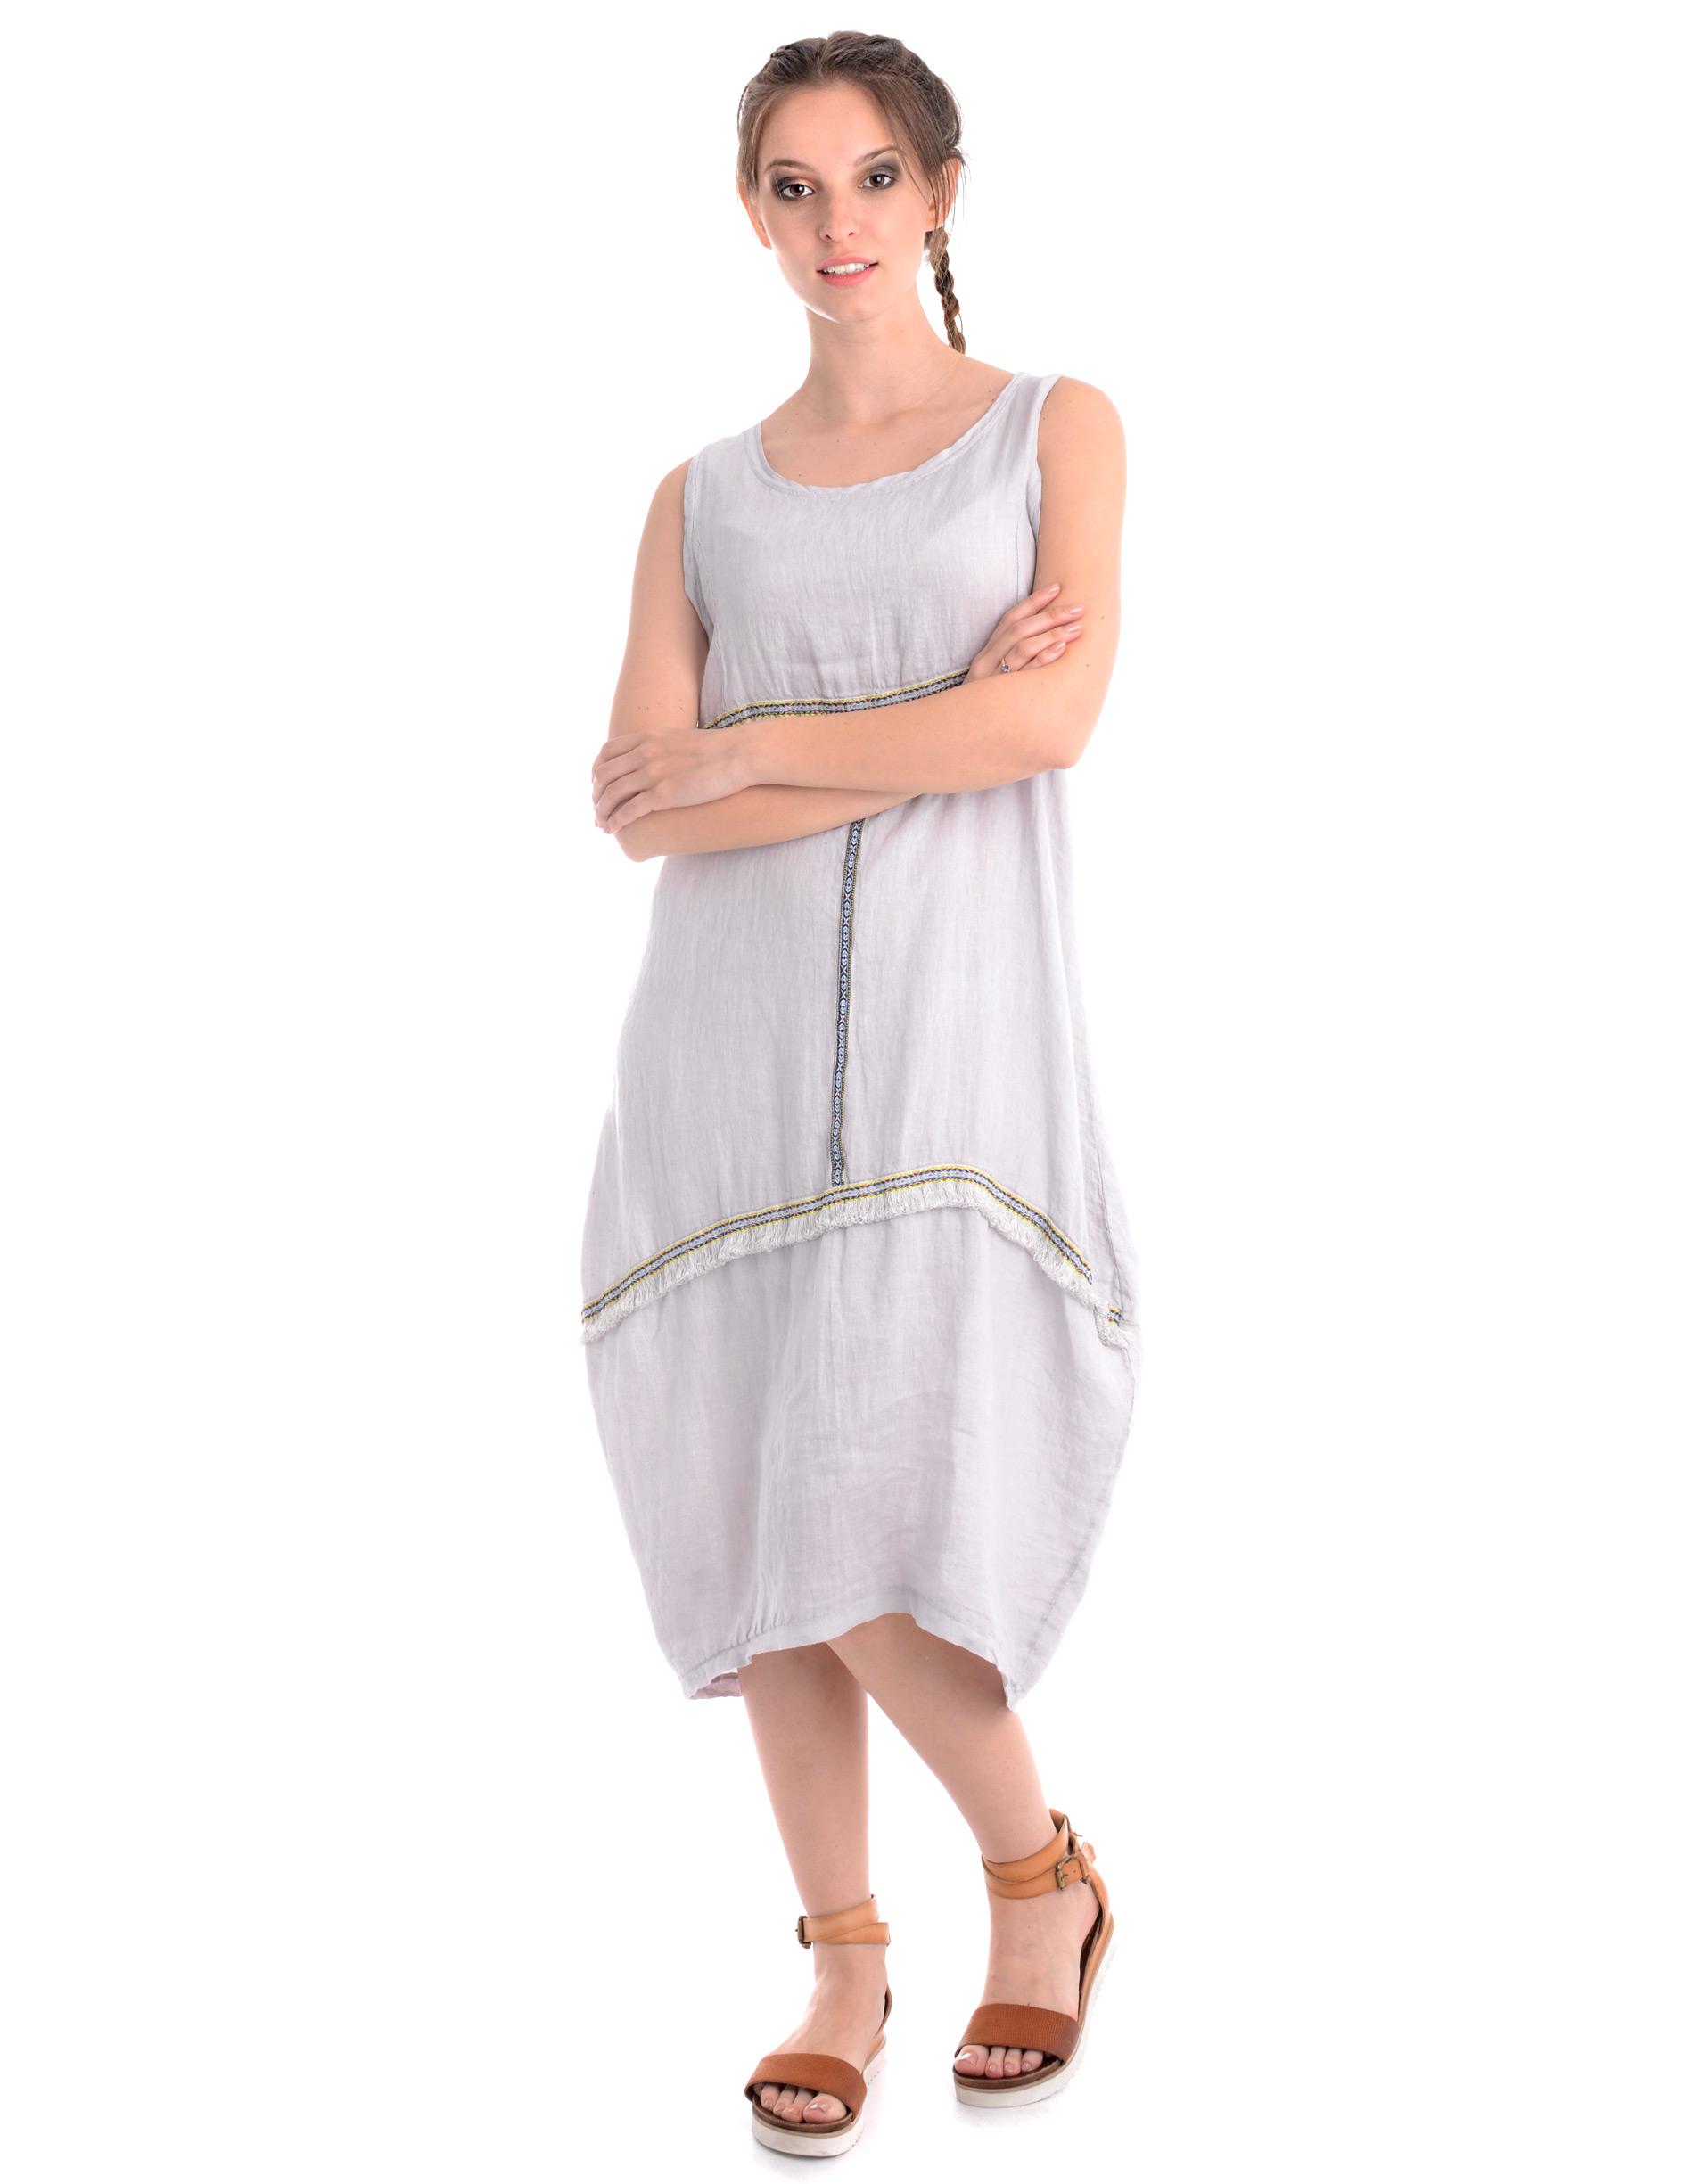 Sukienka - 19-16290 GRIG - Unisono